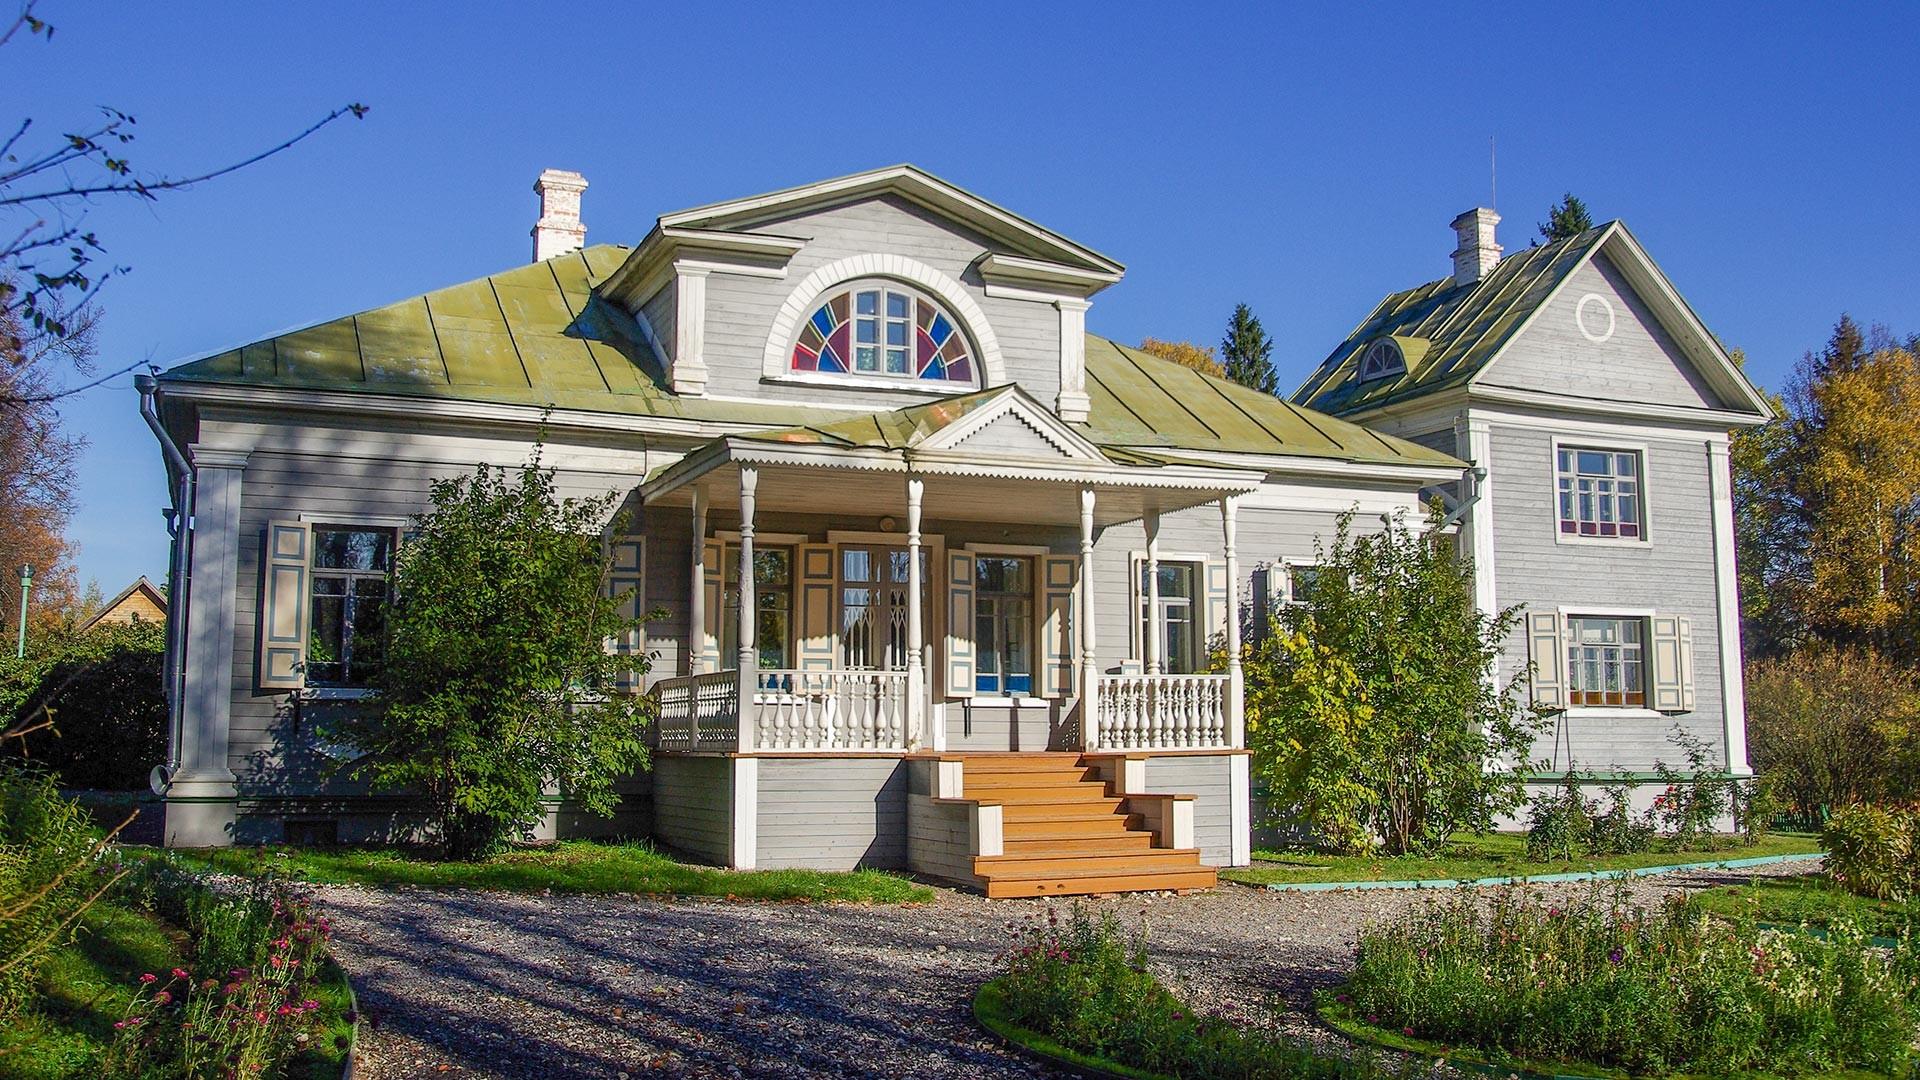 A house in Shakhmatovo